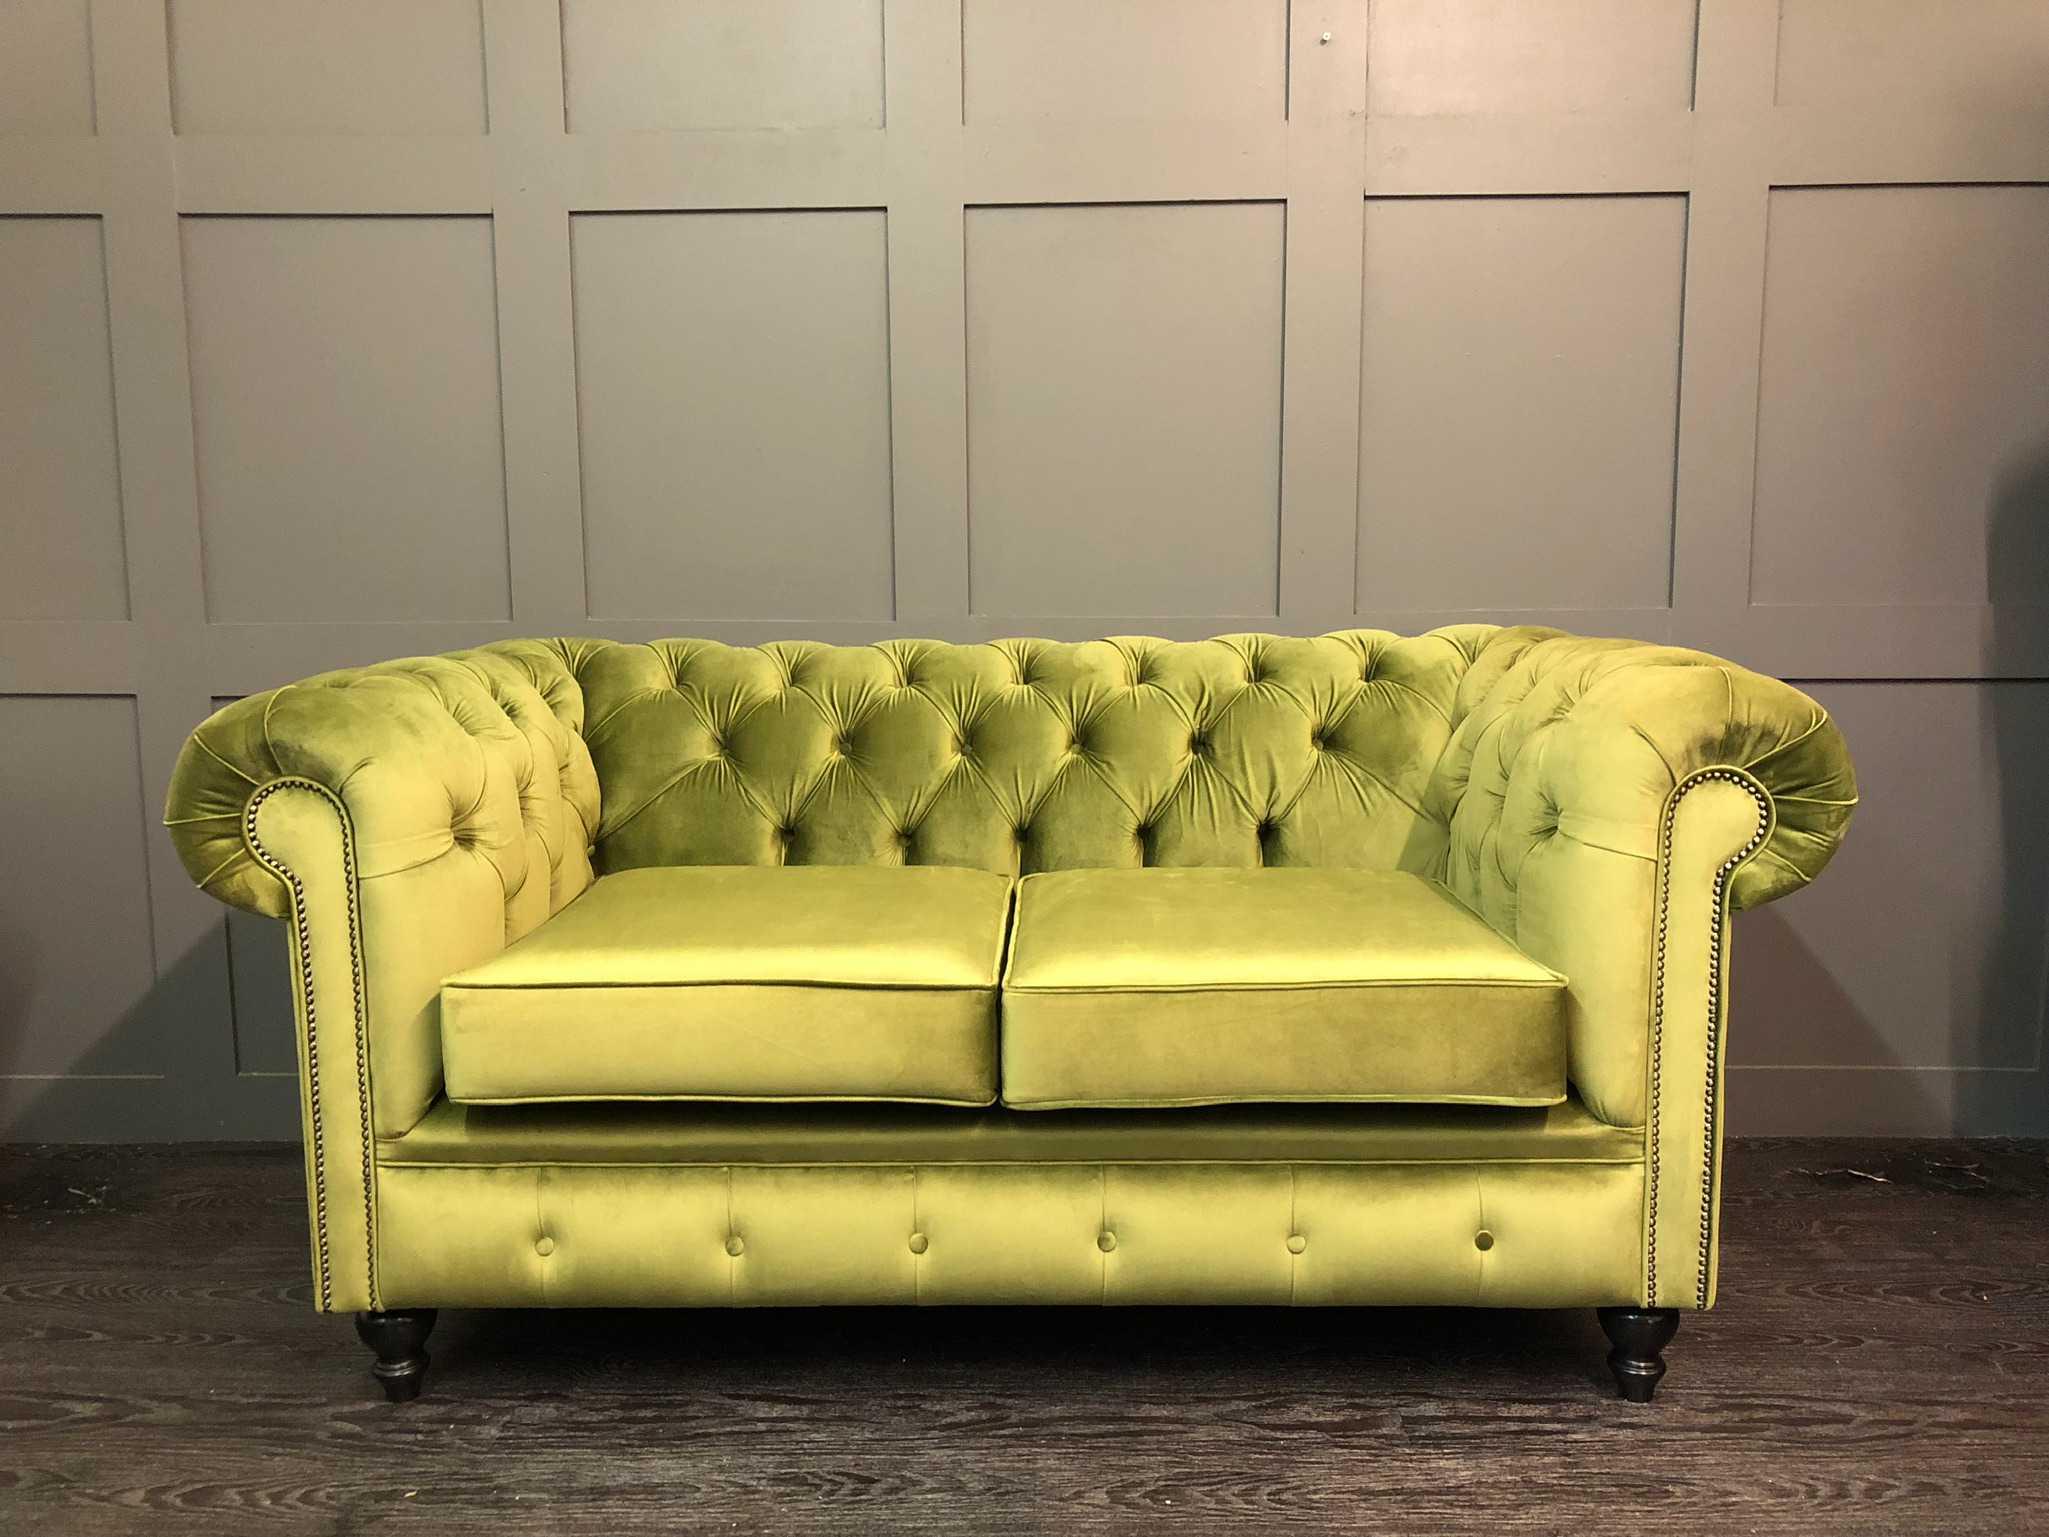 The Essex Cambio Olive Chesterfield Sofa